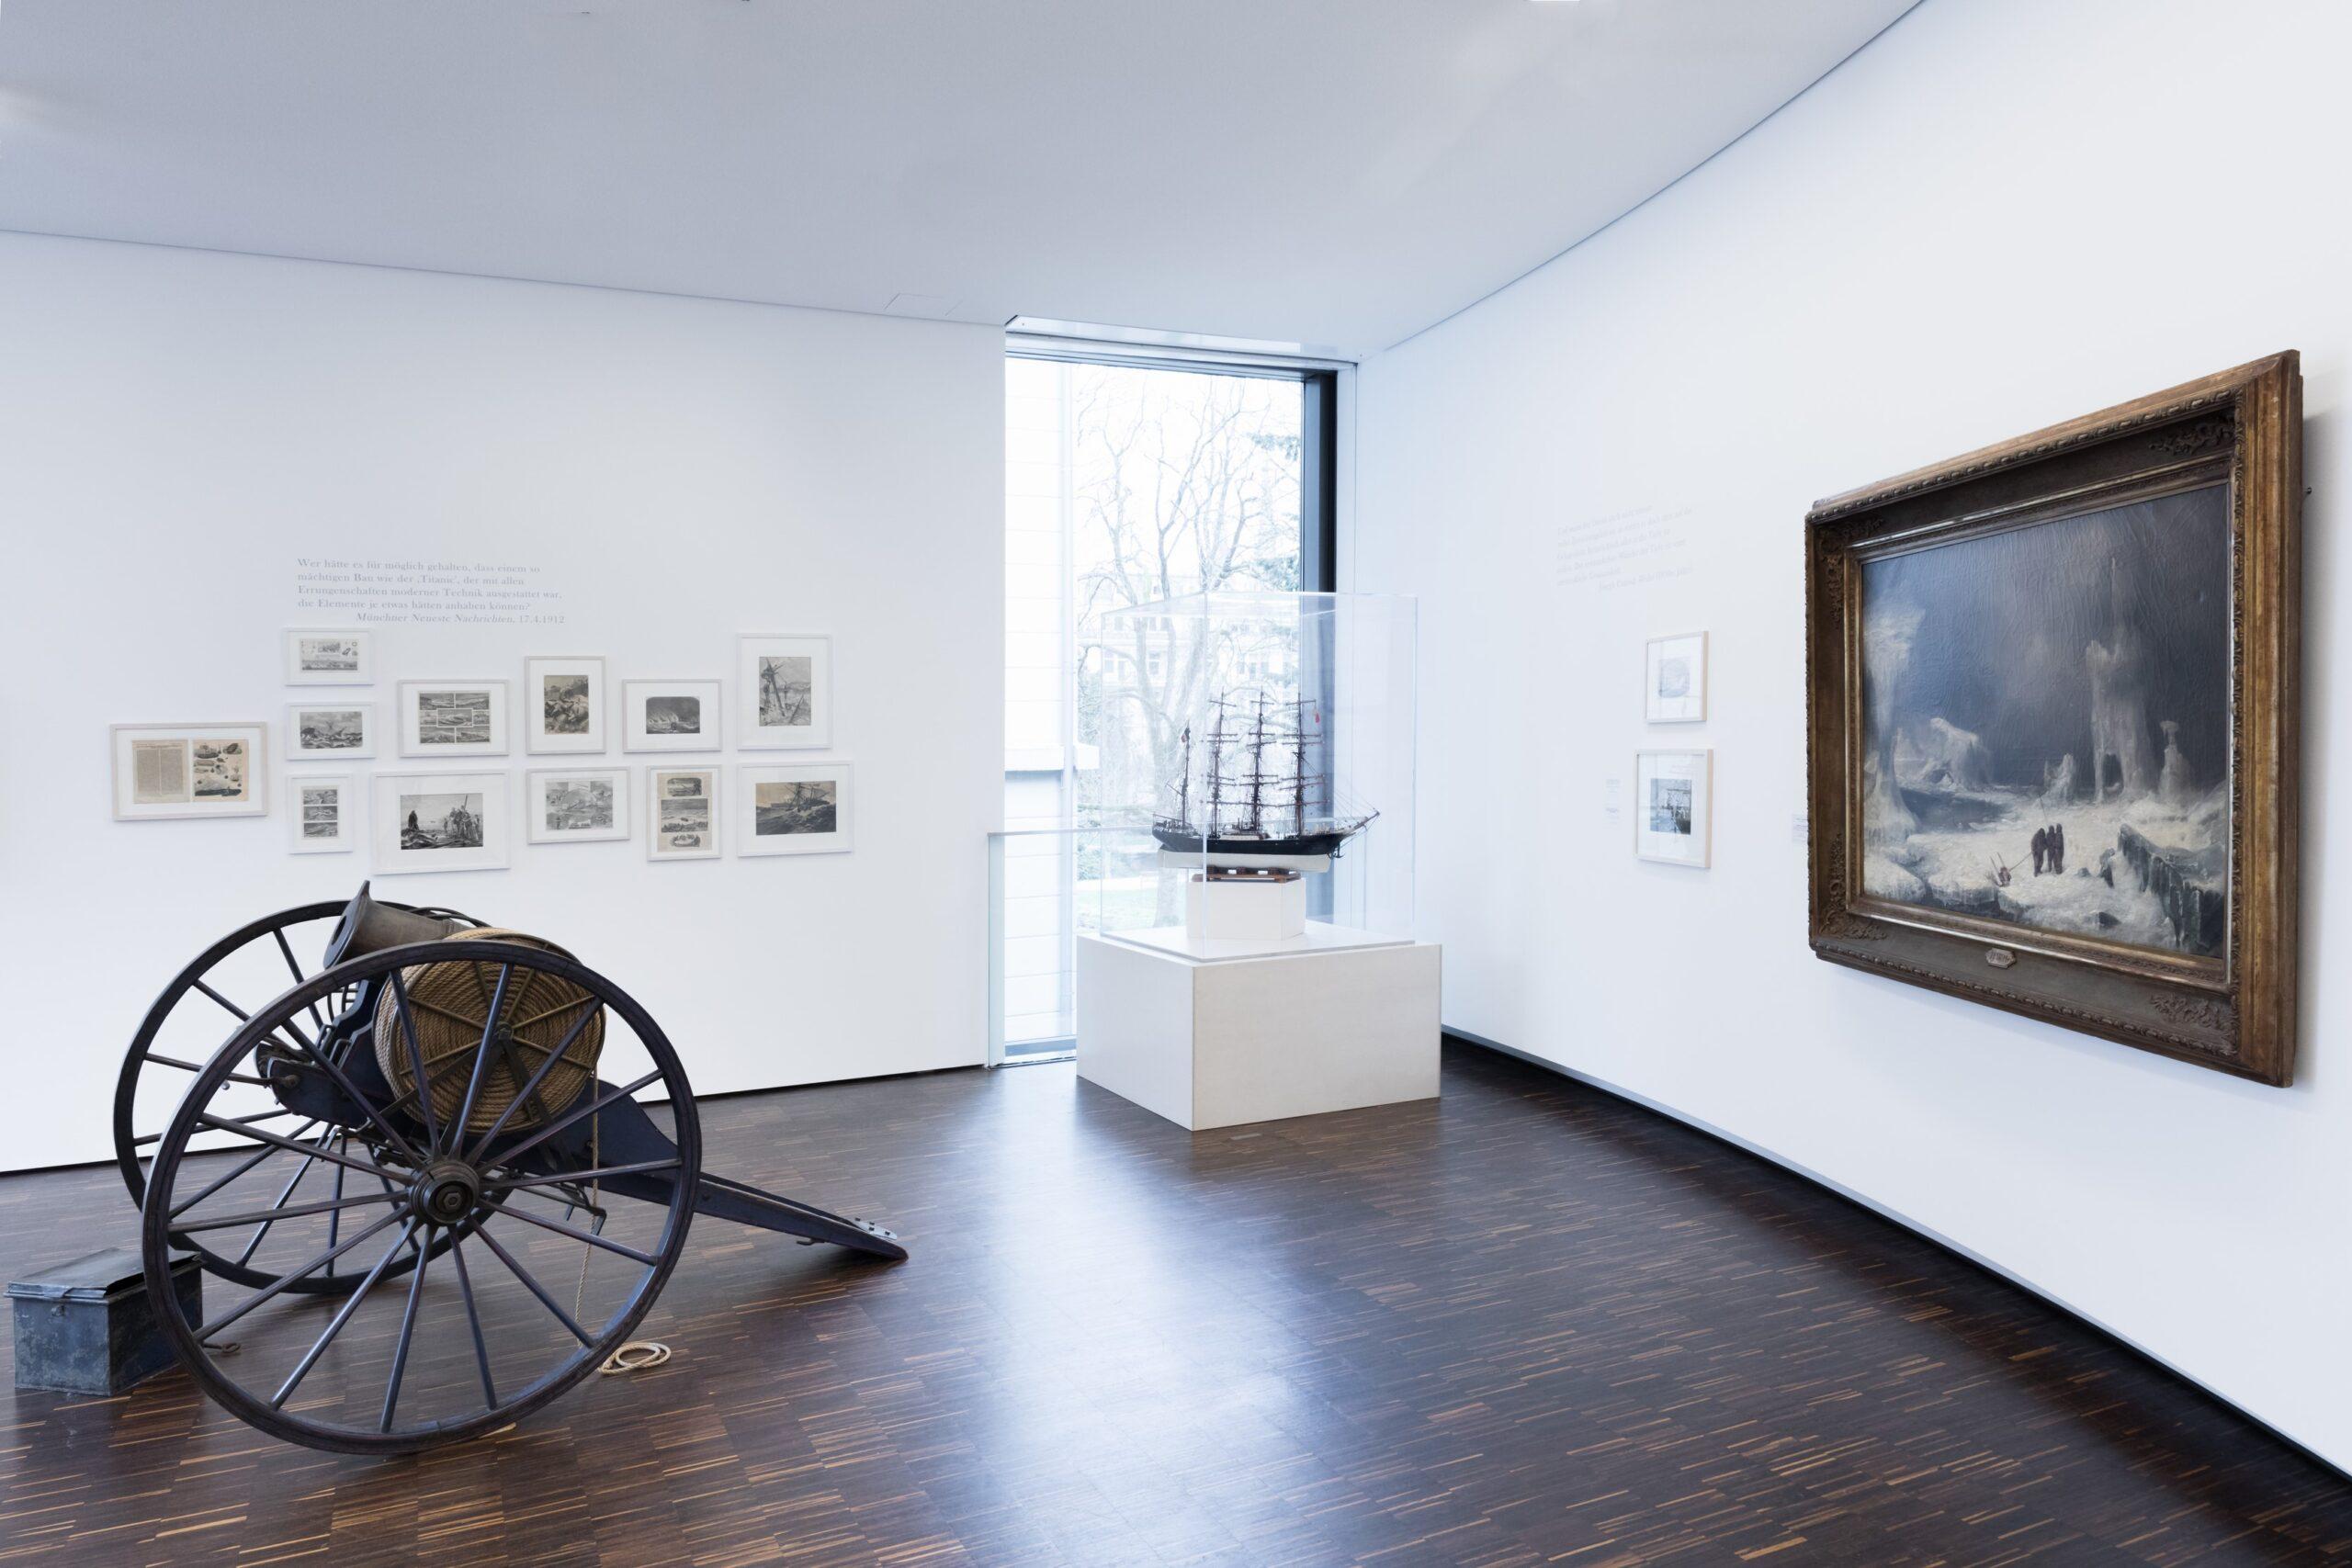 Museum La8 Hohesee Blickindieausstellung F Jesse Kl